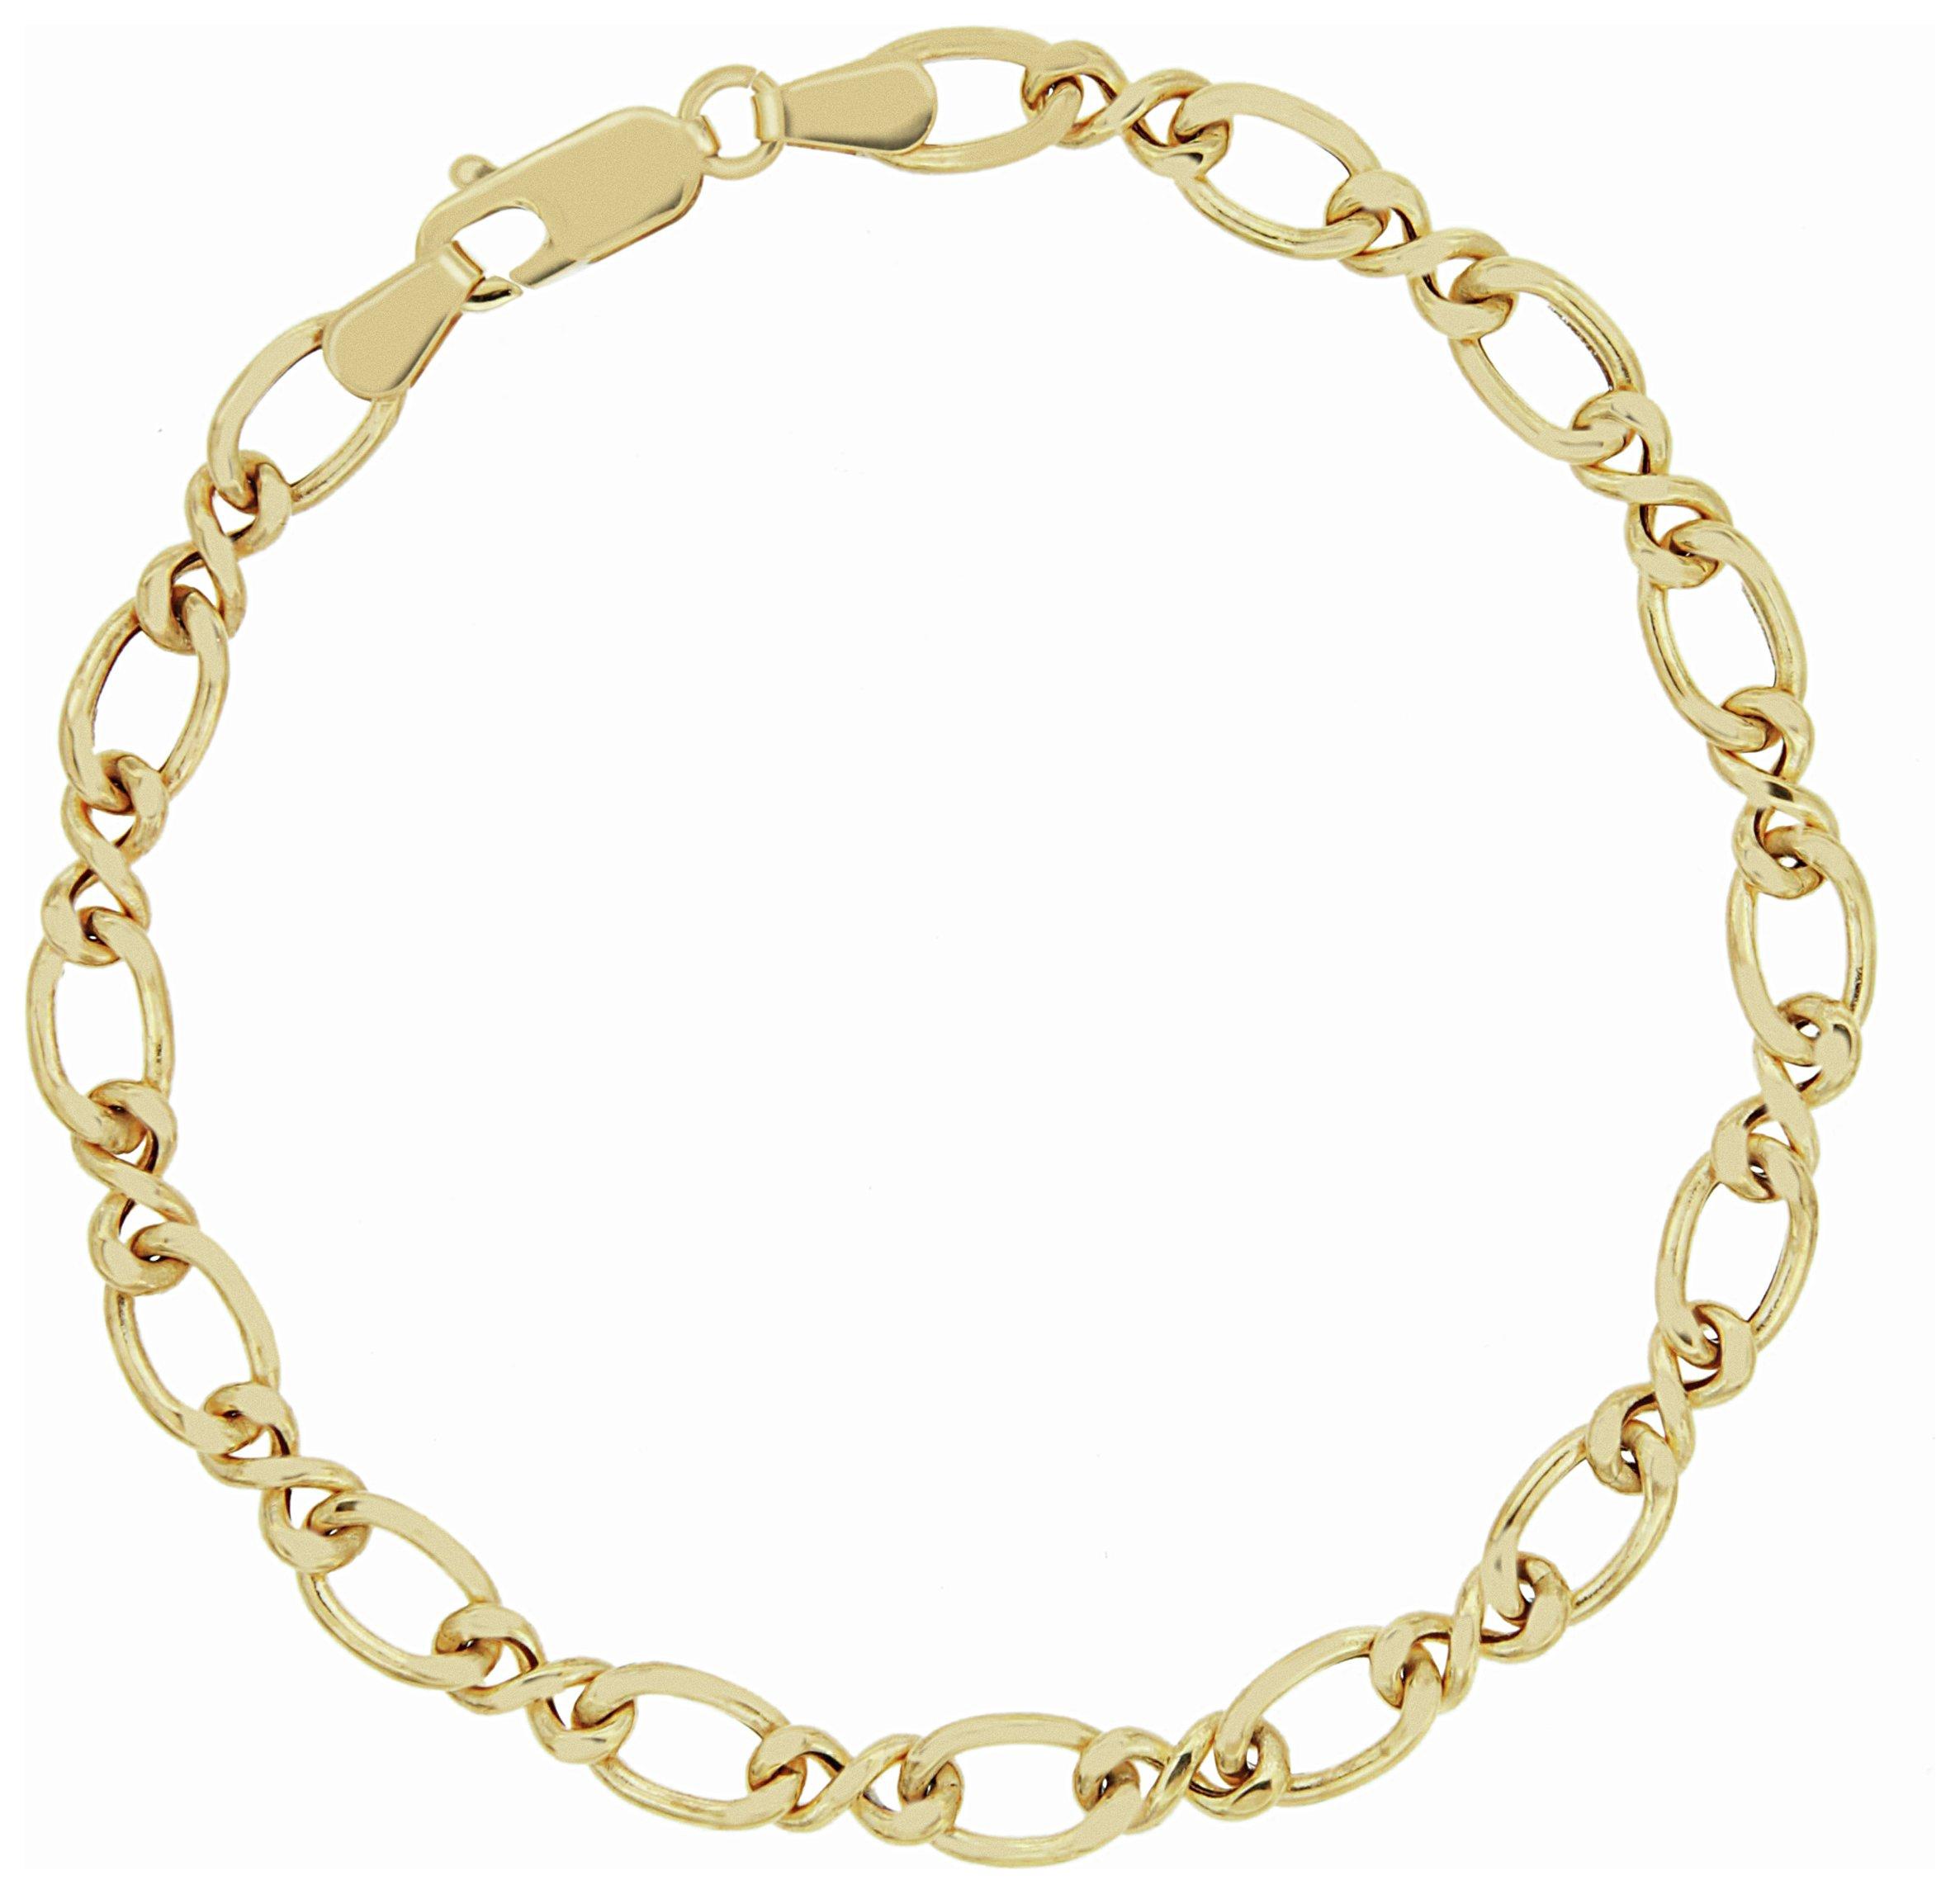 Image of Bracci - 9 Carat Gold - Infinity Link Bracelet.